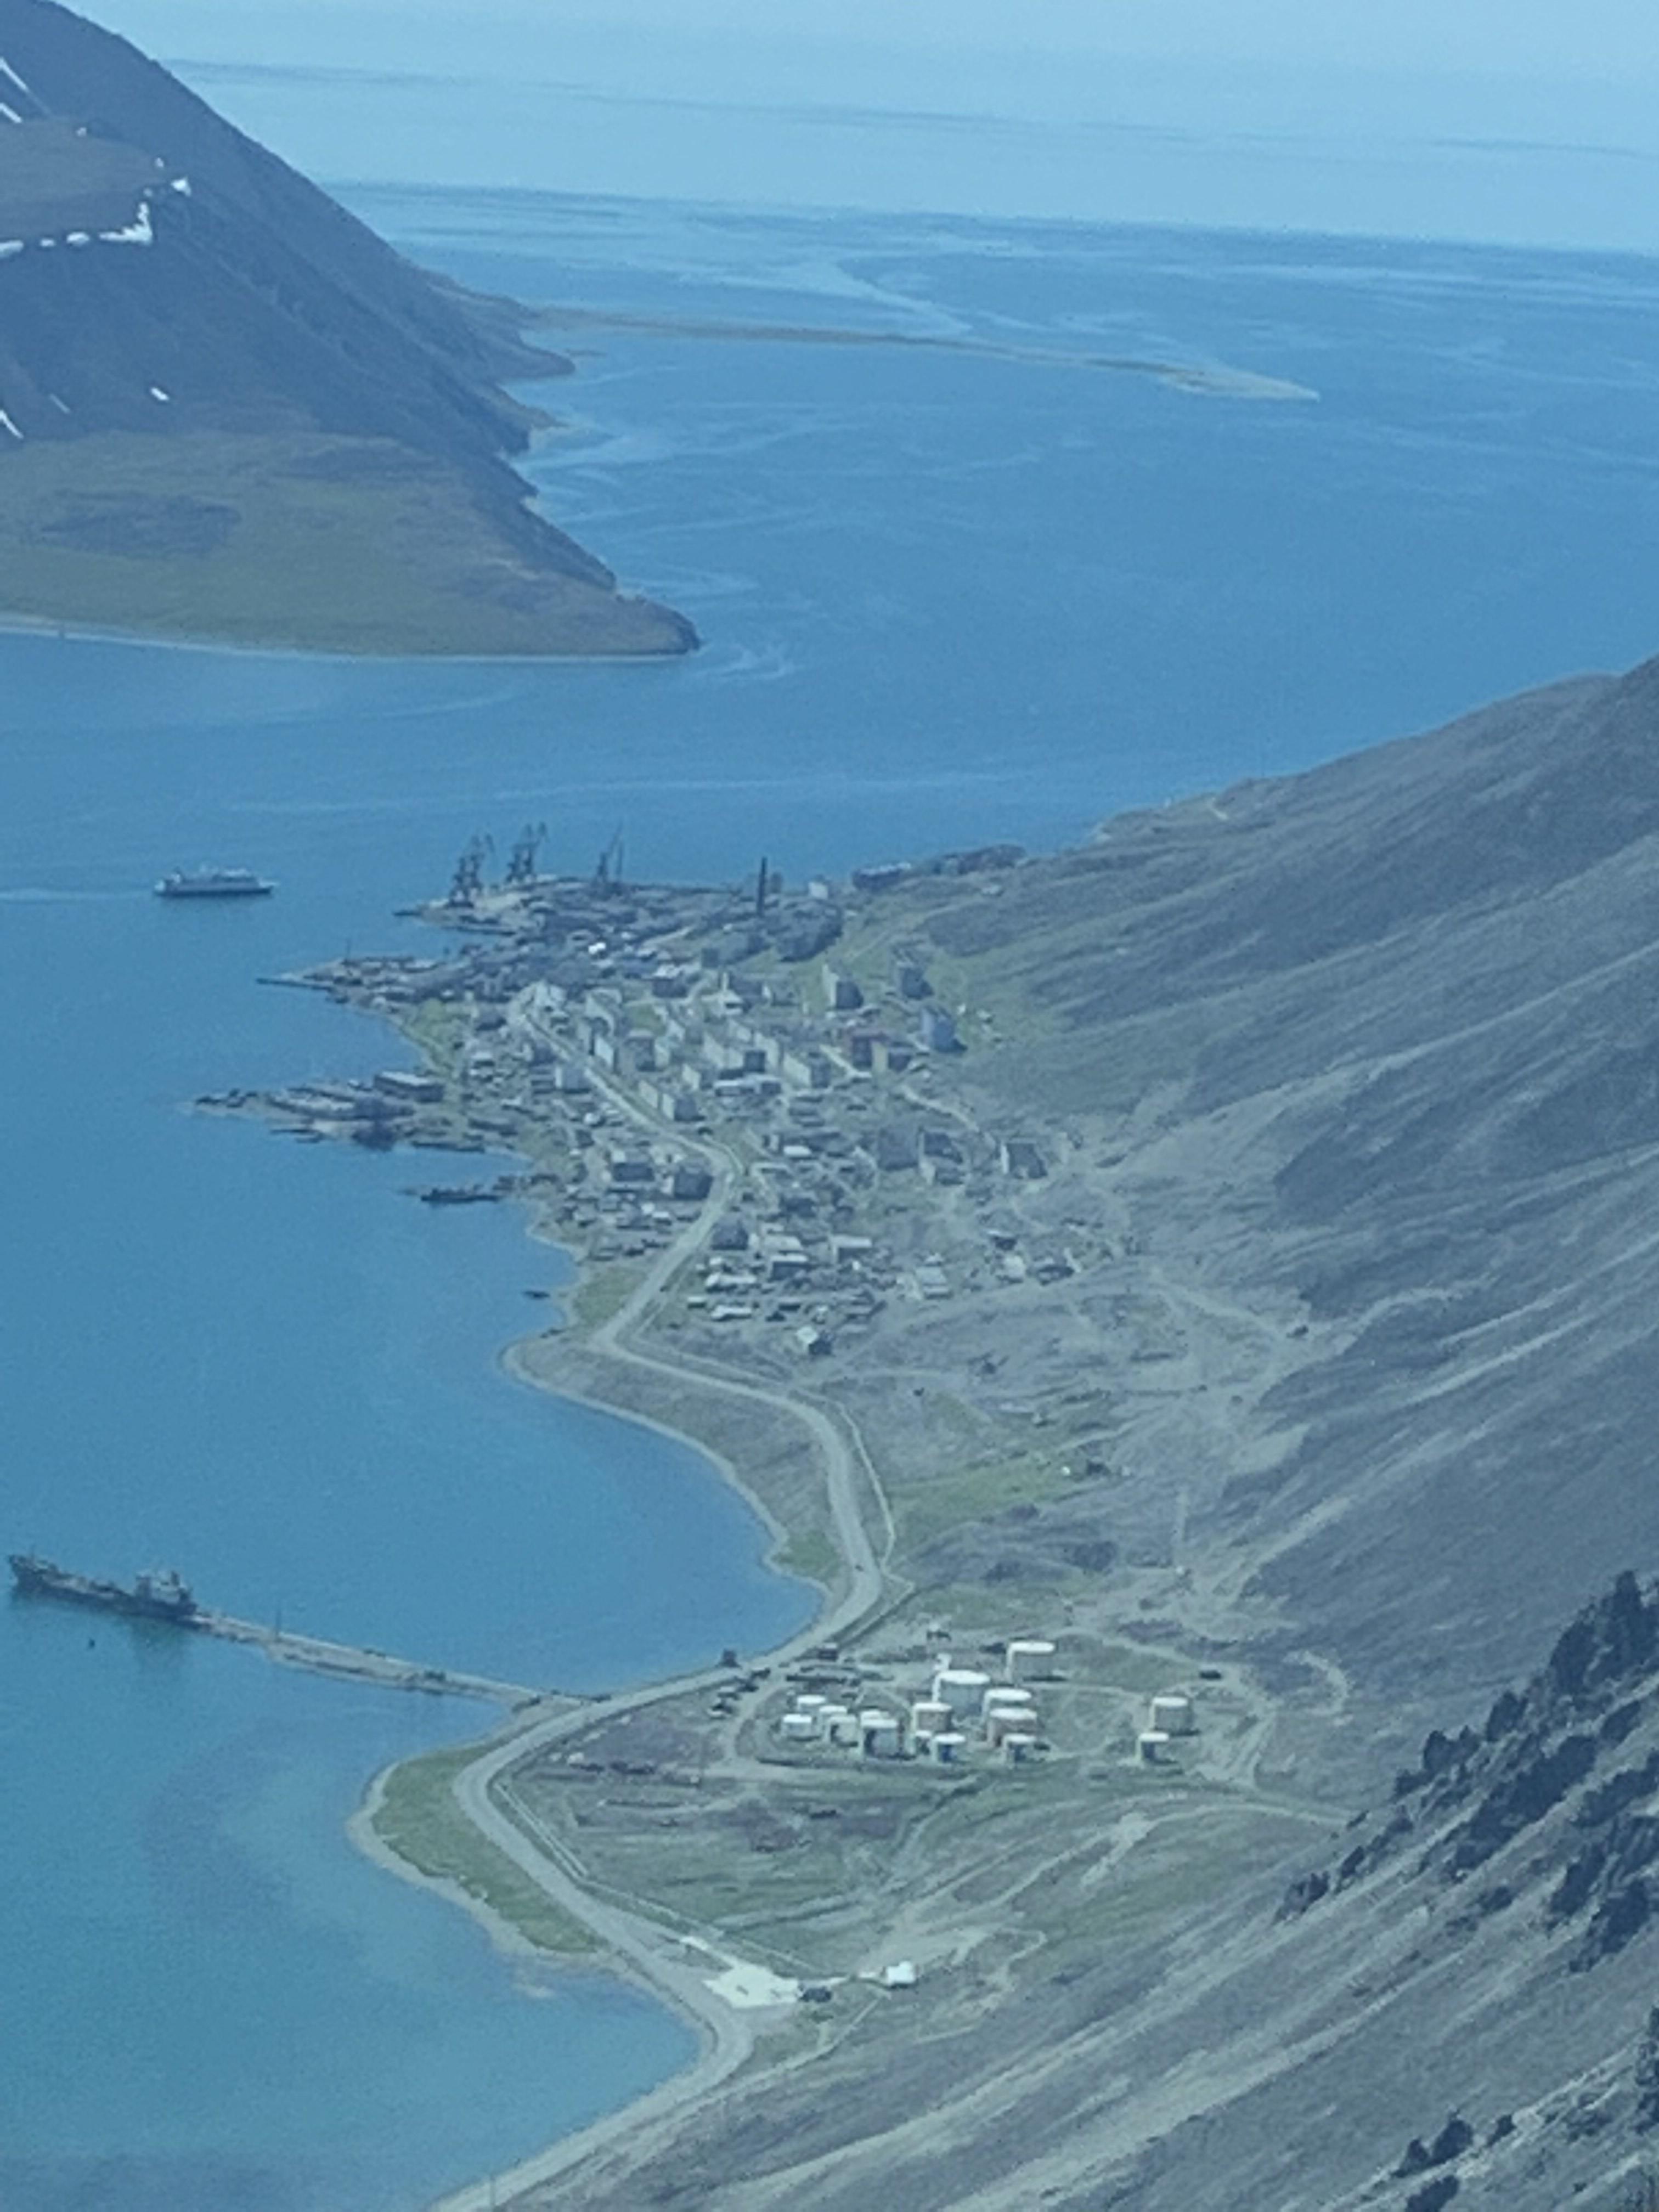 Alaska To Russia >> With An Alaska To Chukotka Flight Travelers Push For Easier